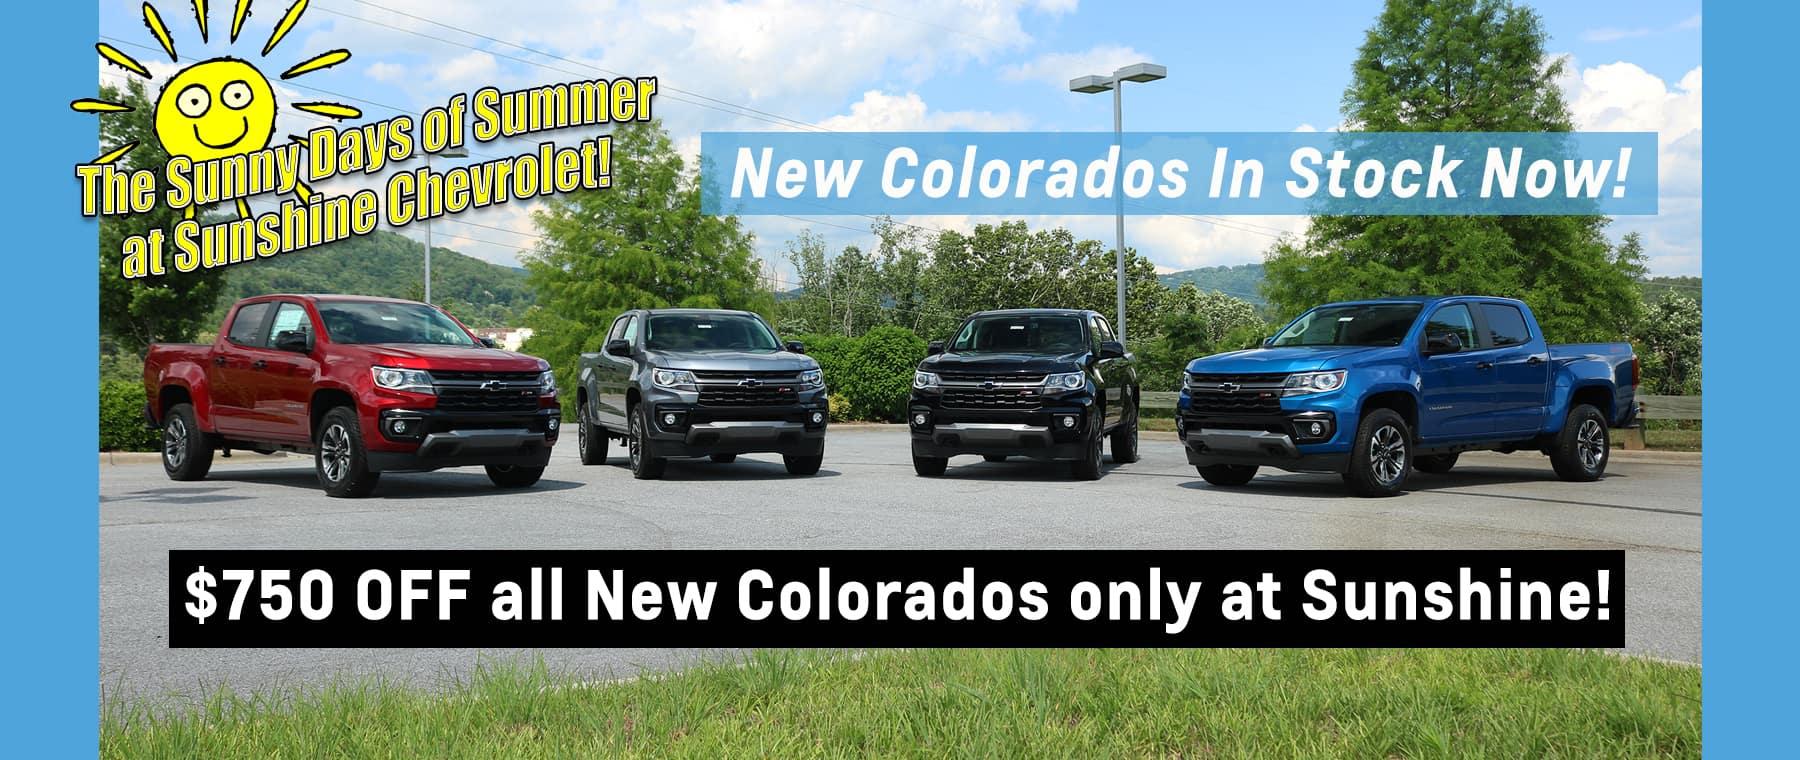 SUN_HERO_Colorados_in_stock_NOW_20210622 copy